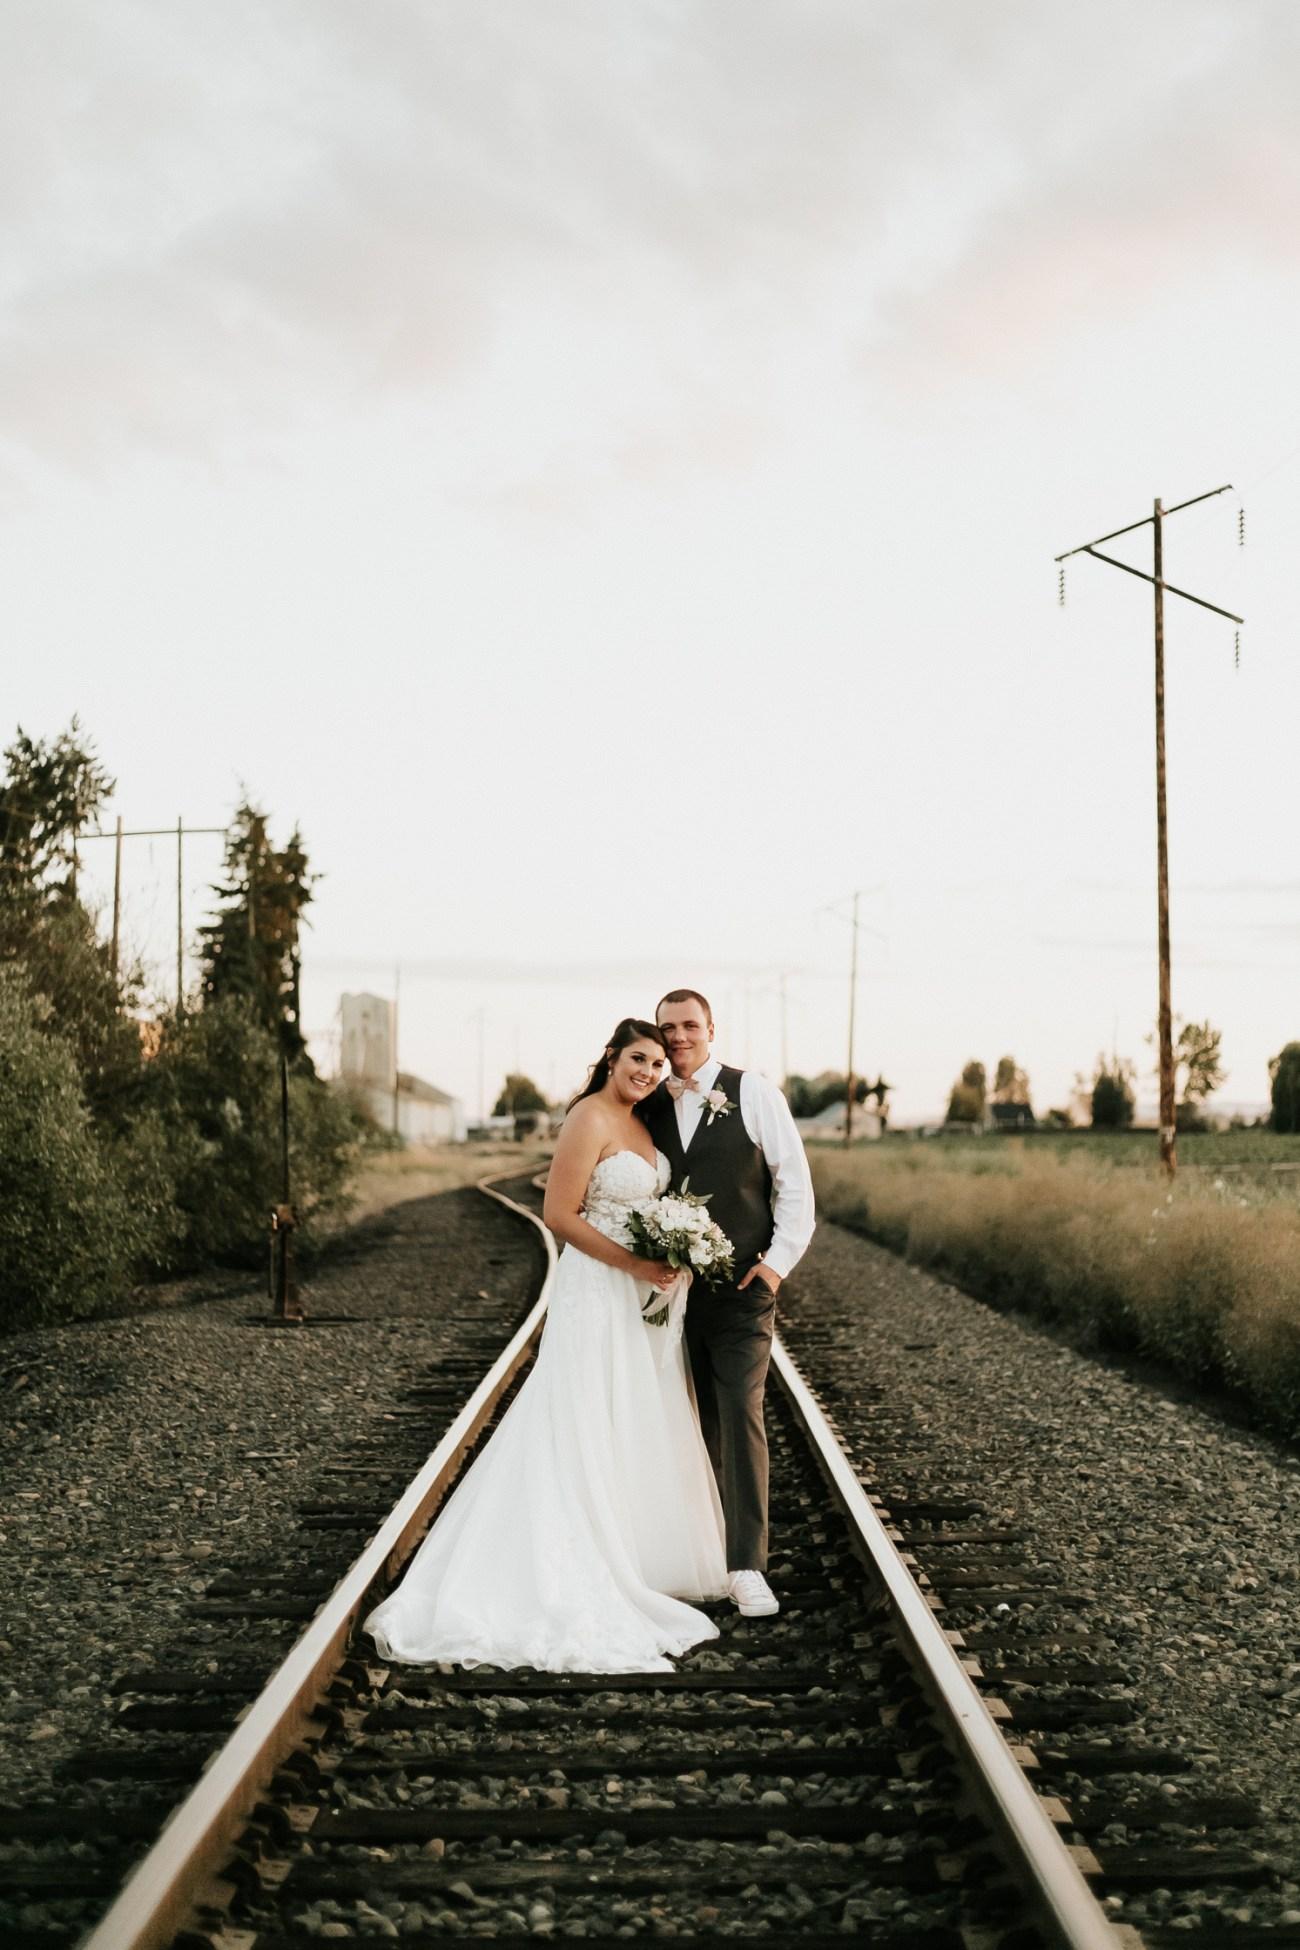 Megan Claire Photography | Arizona Wedding Photographer | Megan-Claire.com | Beautiful summer wedding in Portland, Oregon. Summer forest wedding inspiration. Bride and groom portraits on train tracks